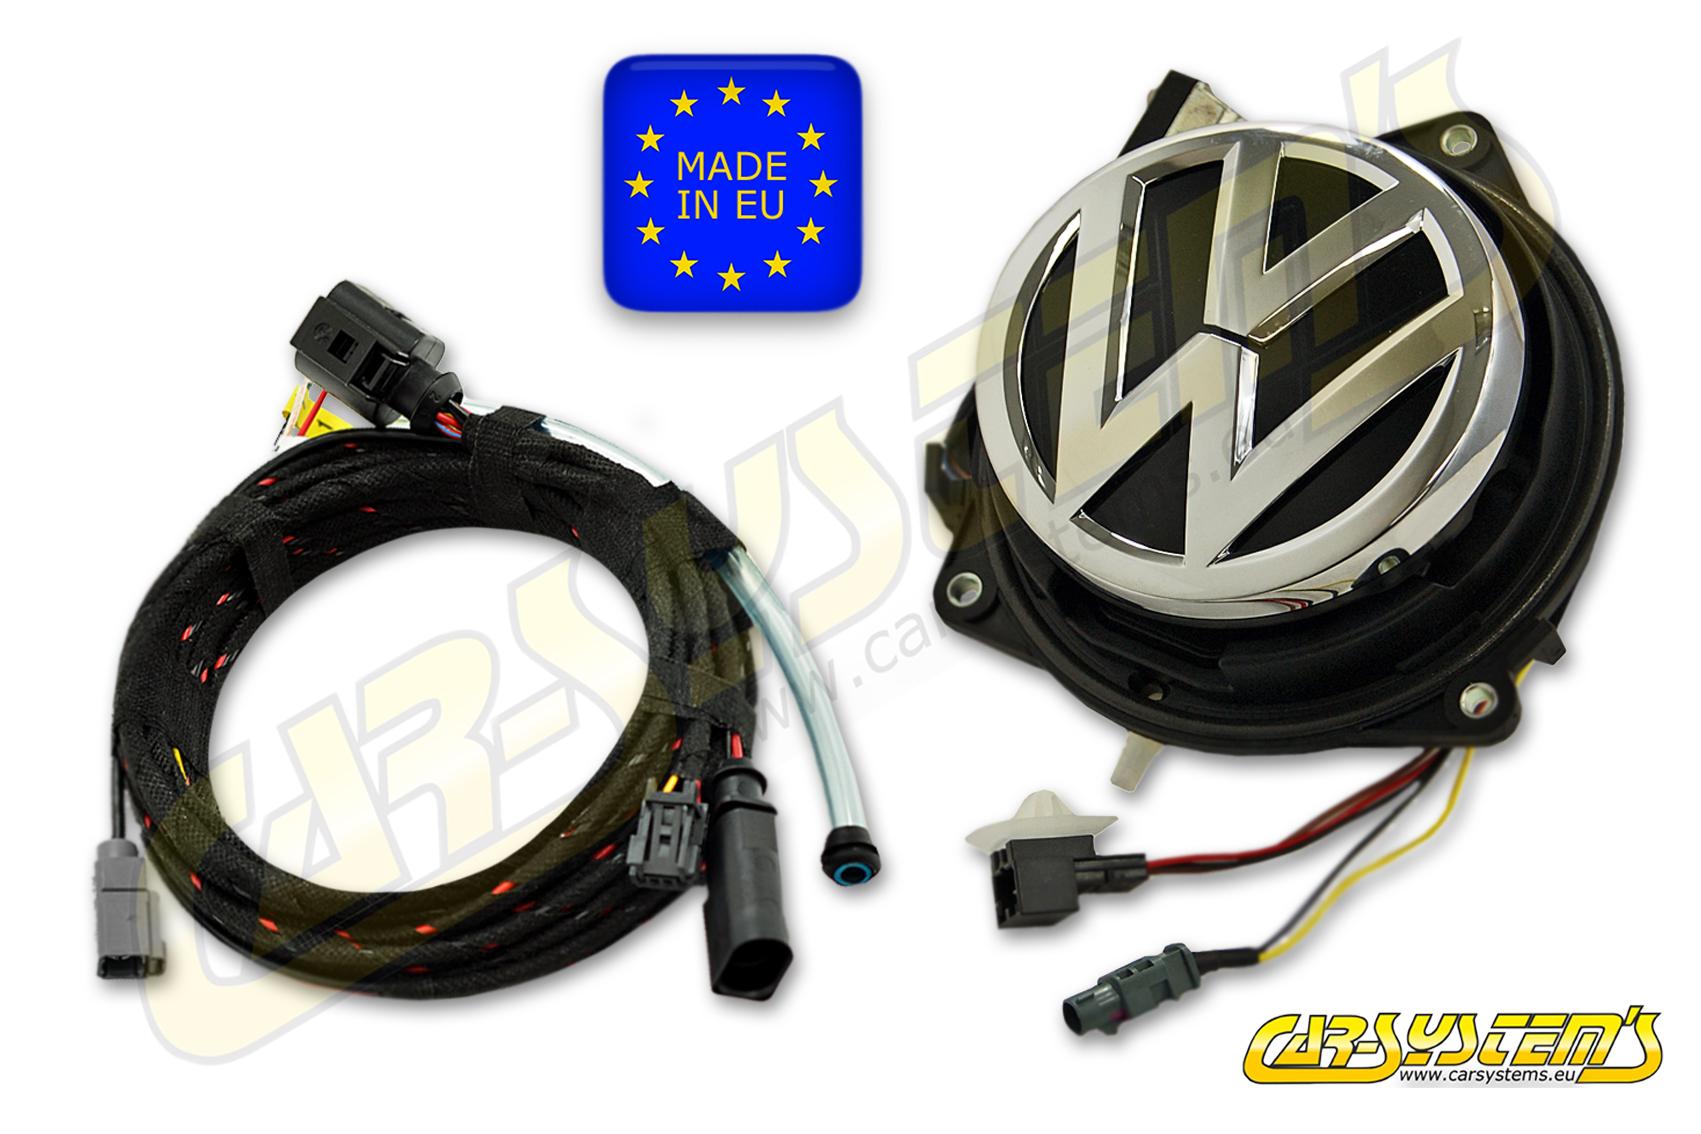 Details about VW Genuine Reversing Camera - Retrofit Kit Golf Mk7 VII  5G0827469F RVC Low Line